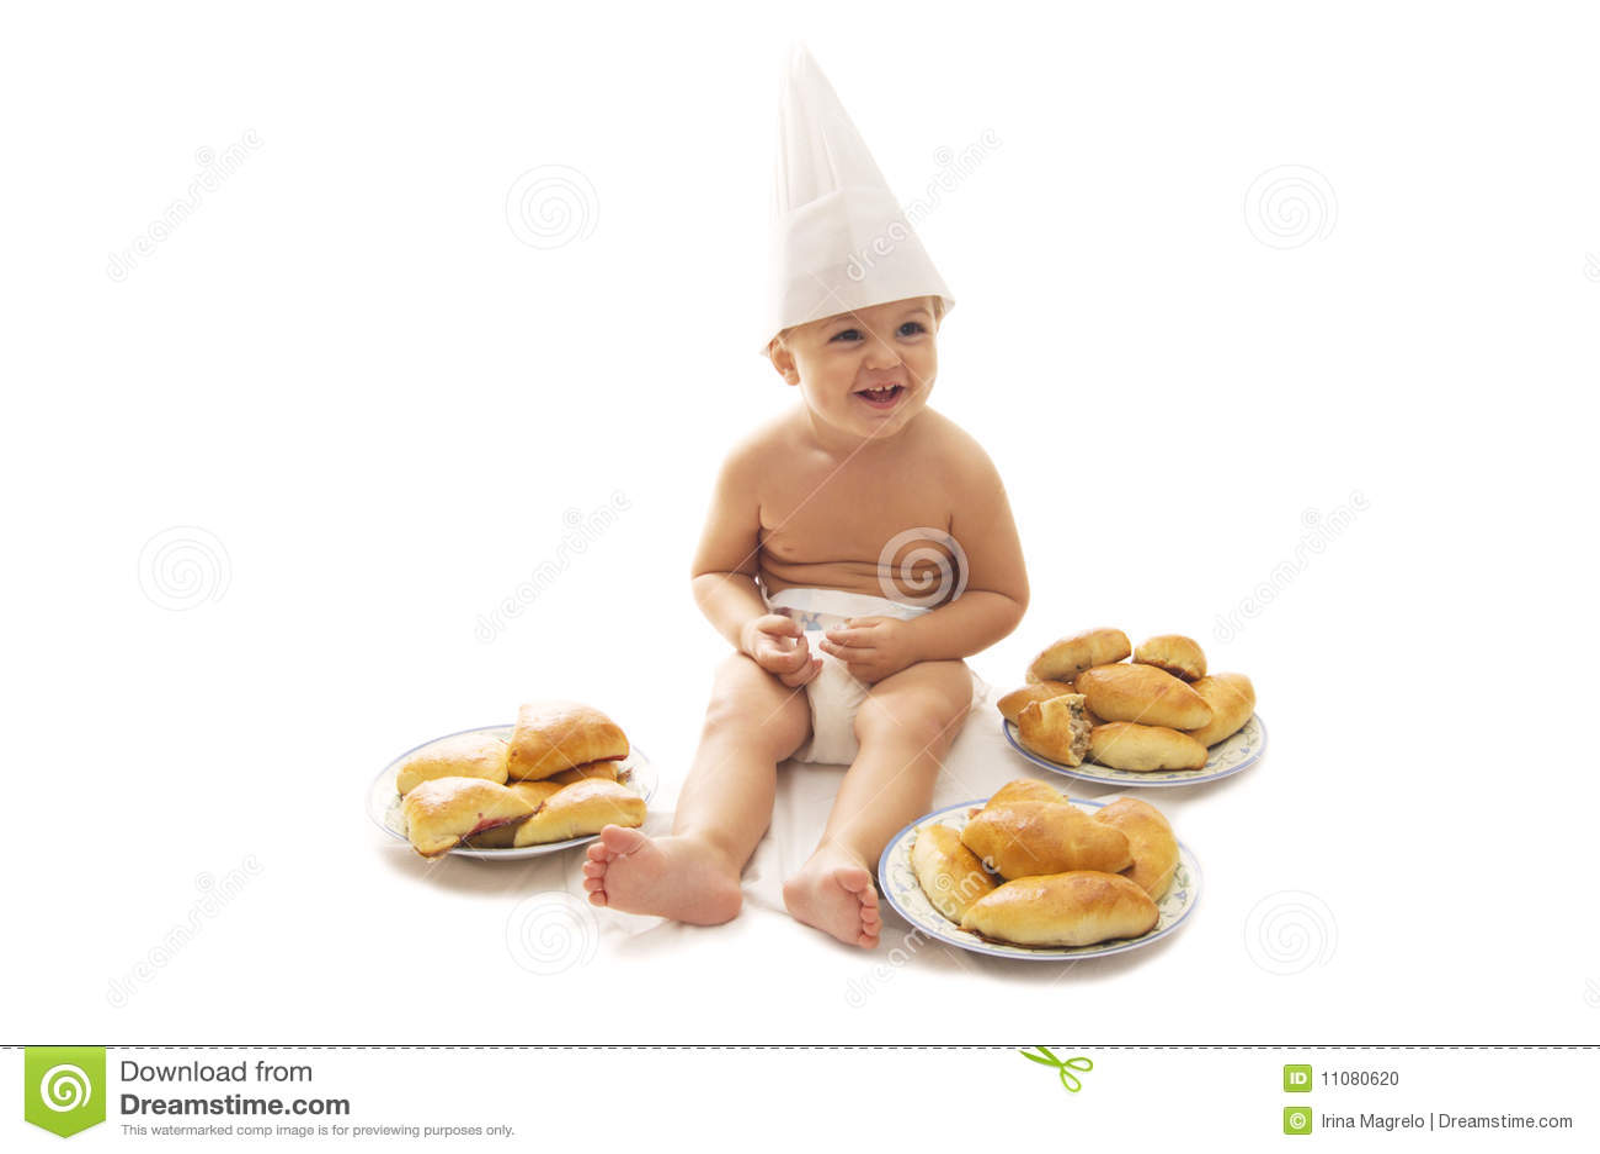 Chef baby